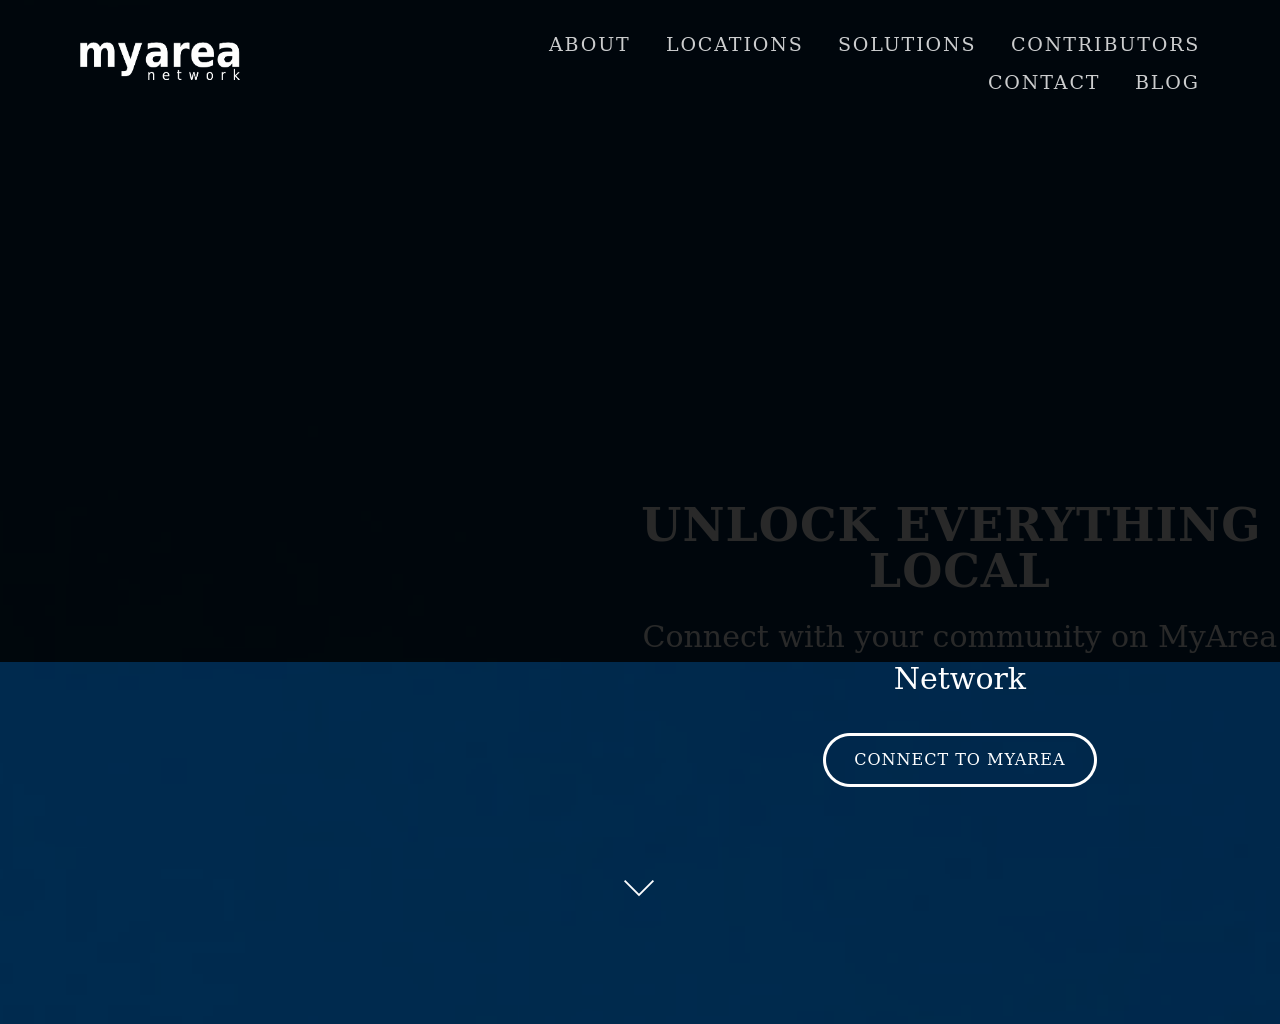 MyArea-Network-Advertising-Reviews-Pricing